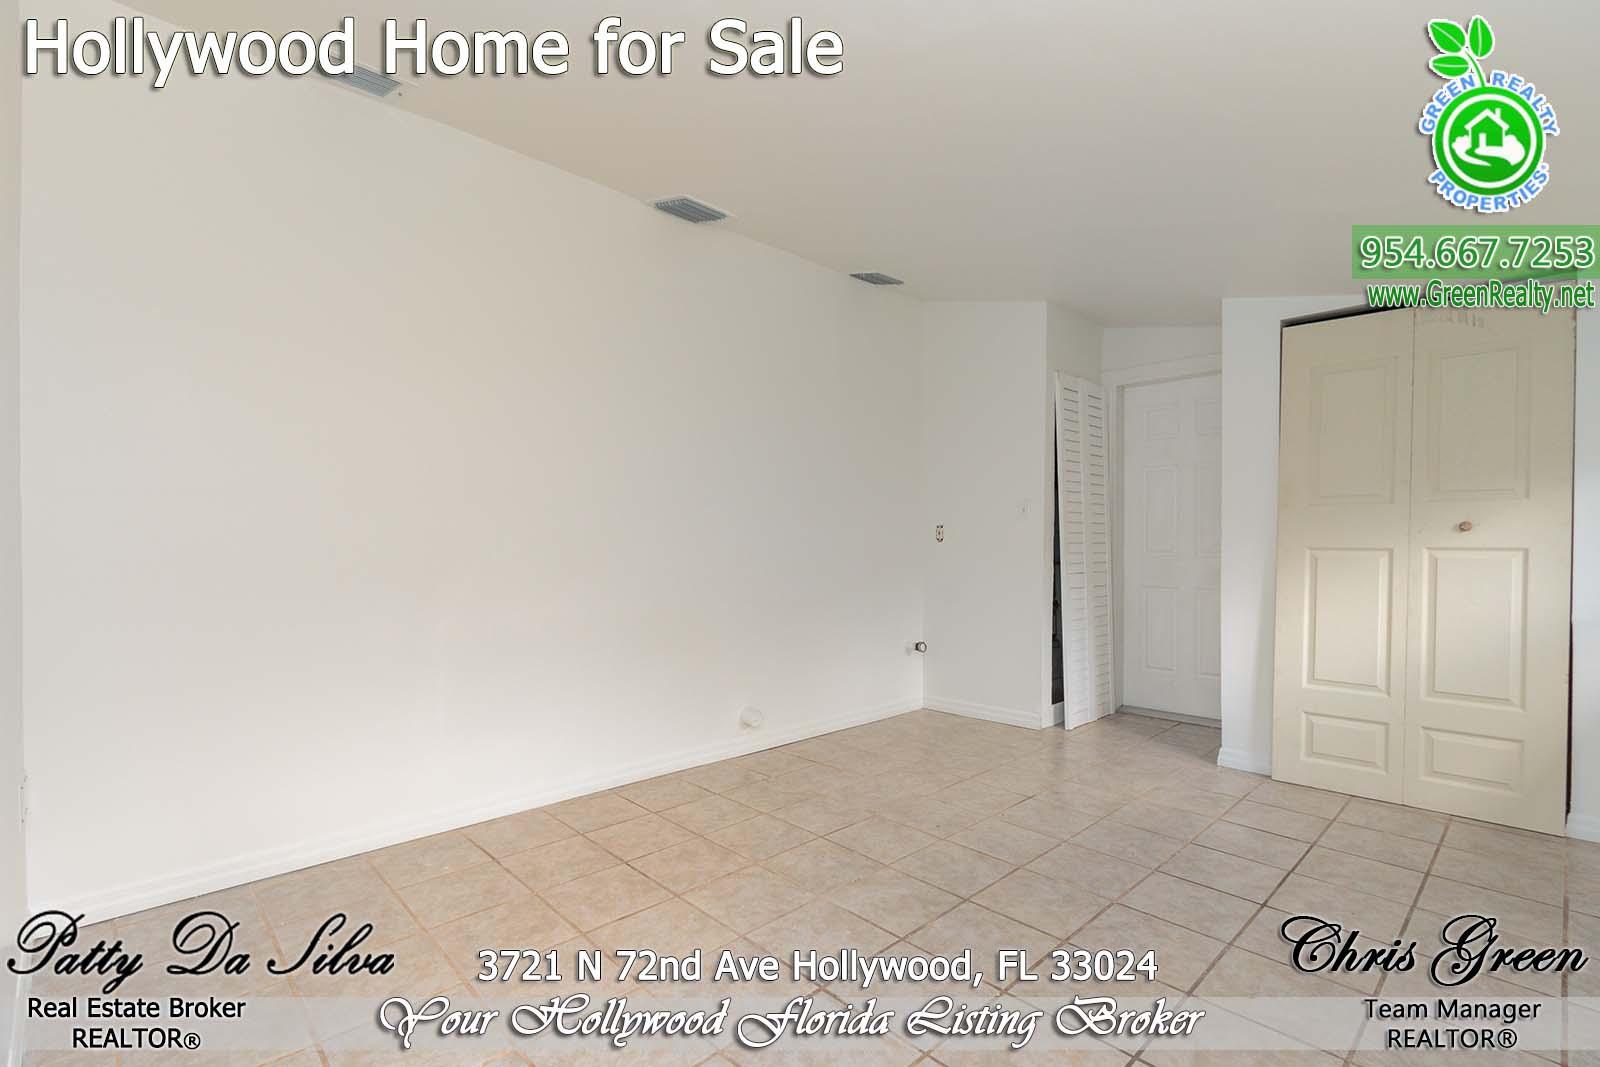 20 Hollywood Florida Real Estate Listing Patty Da Silva Green Realty properties (21)